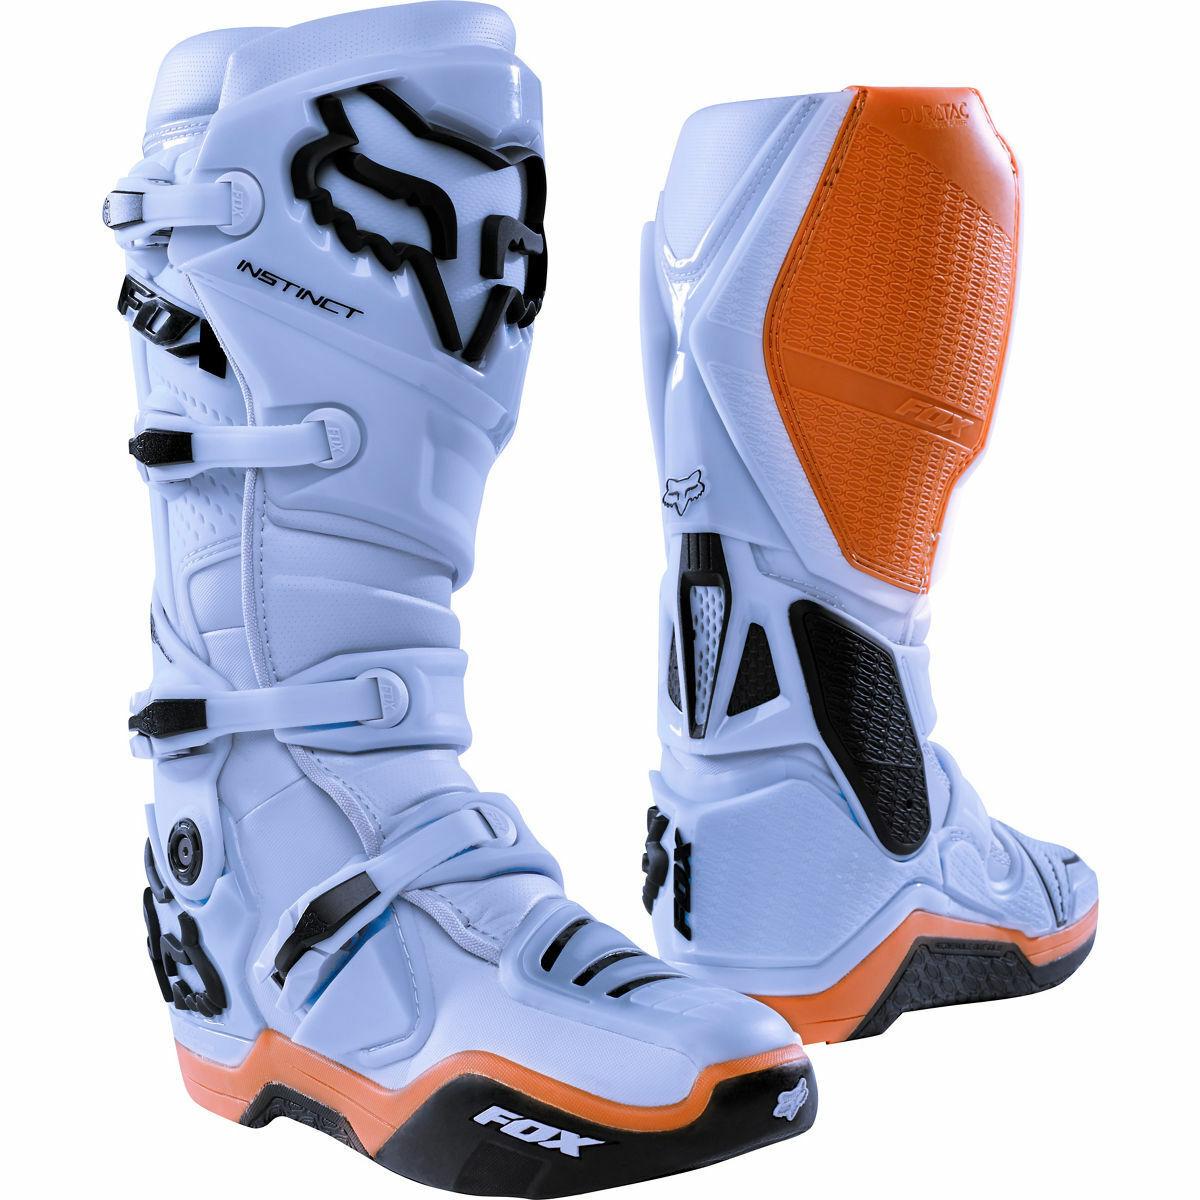 New Fox Racing Instinct Motocross Boots Light Grey Botas Stivali Enduro OUTLET